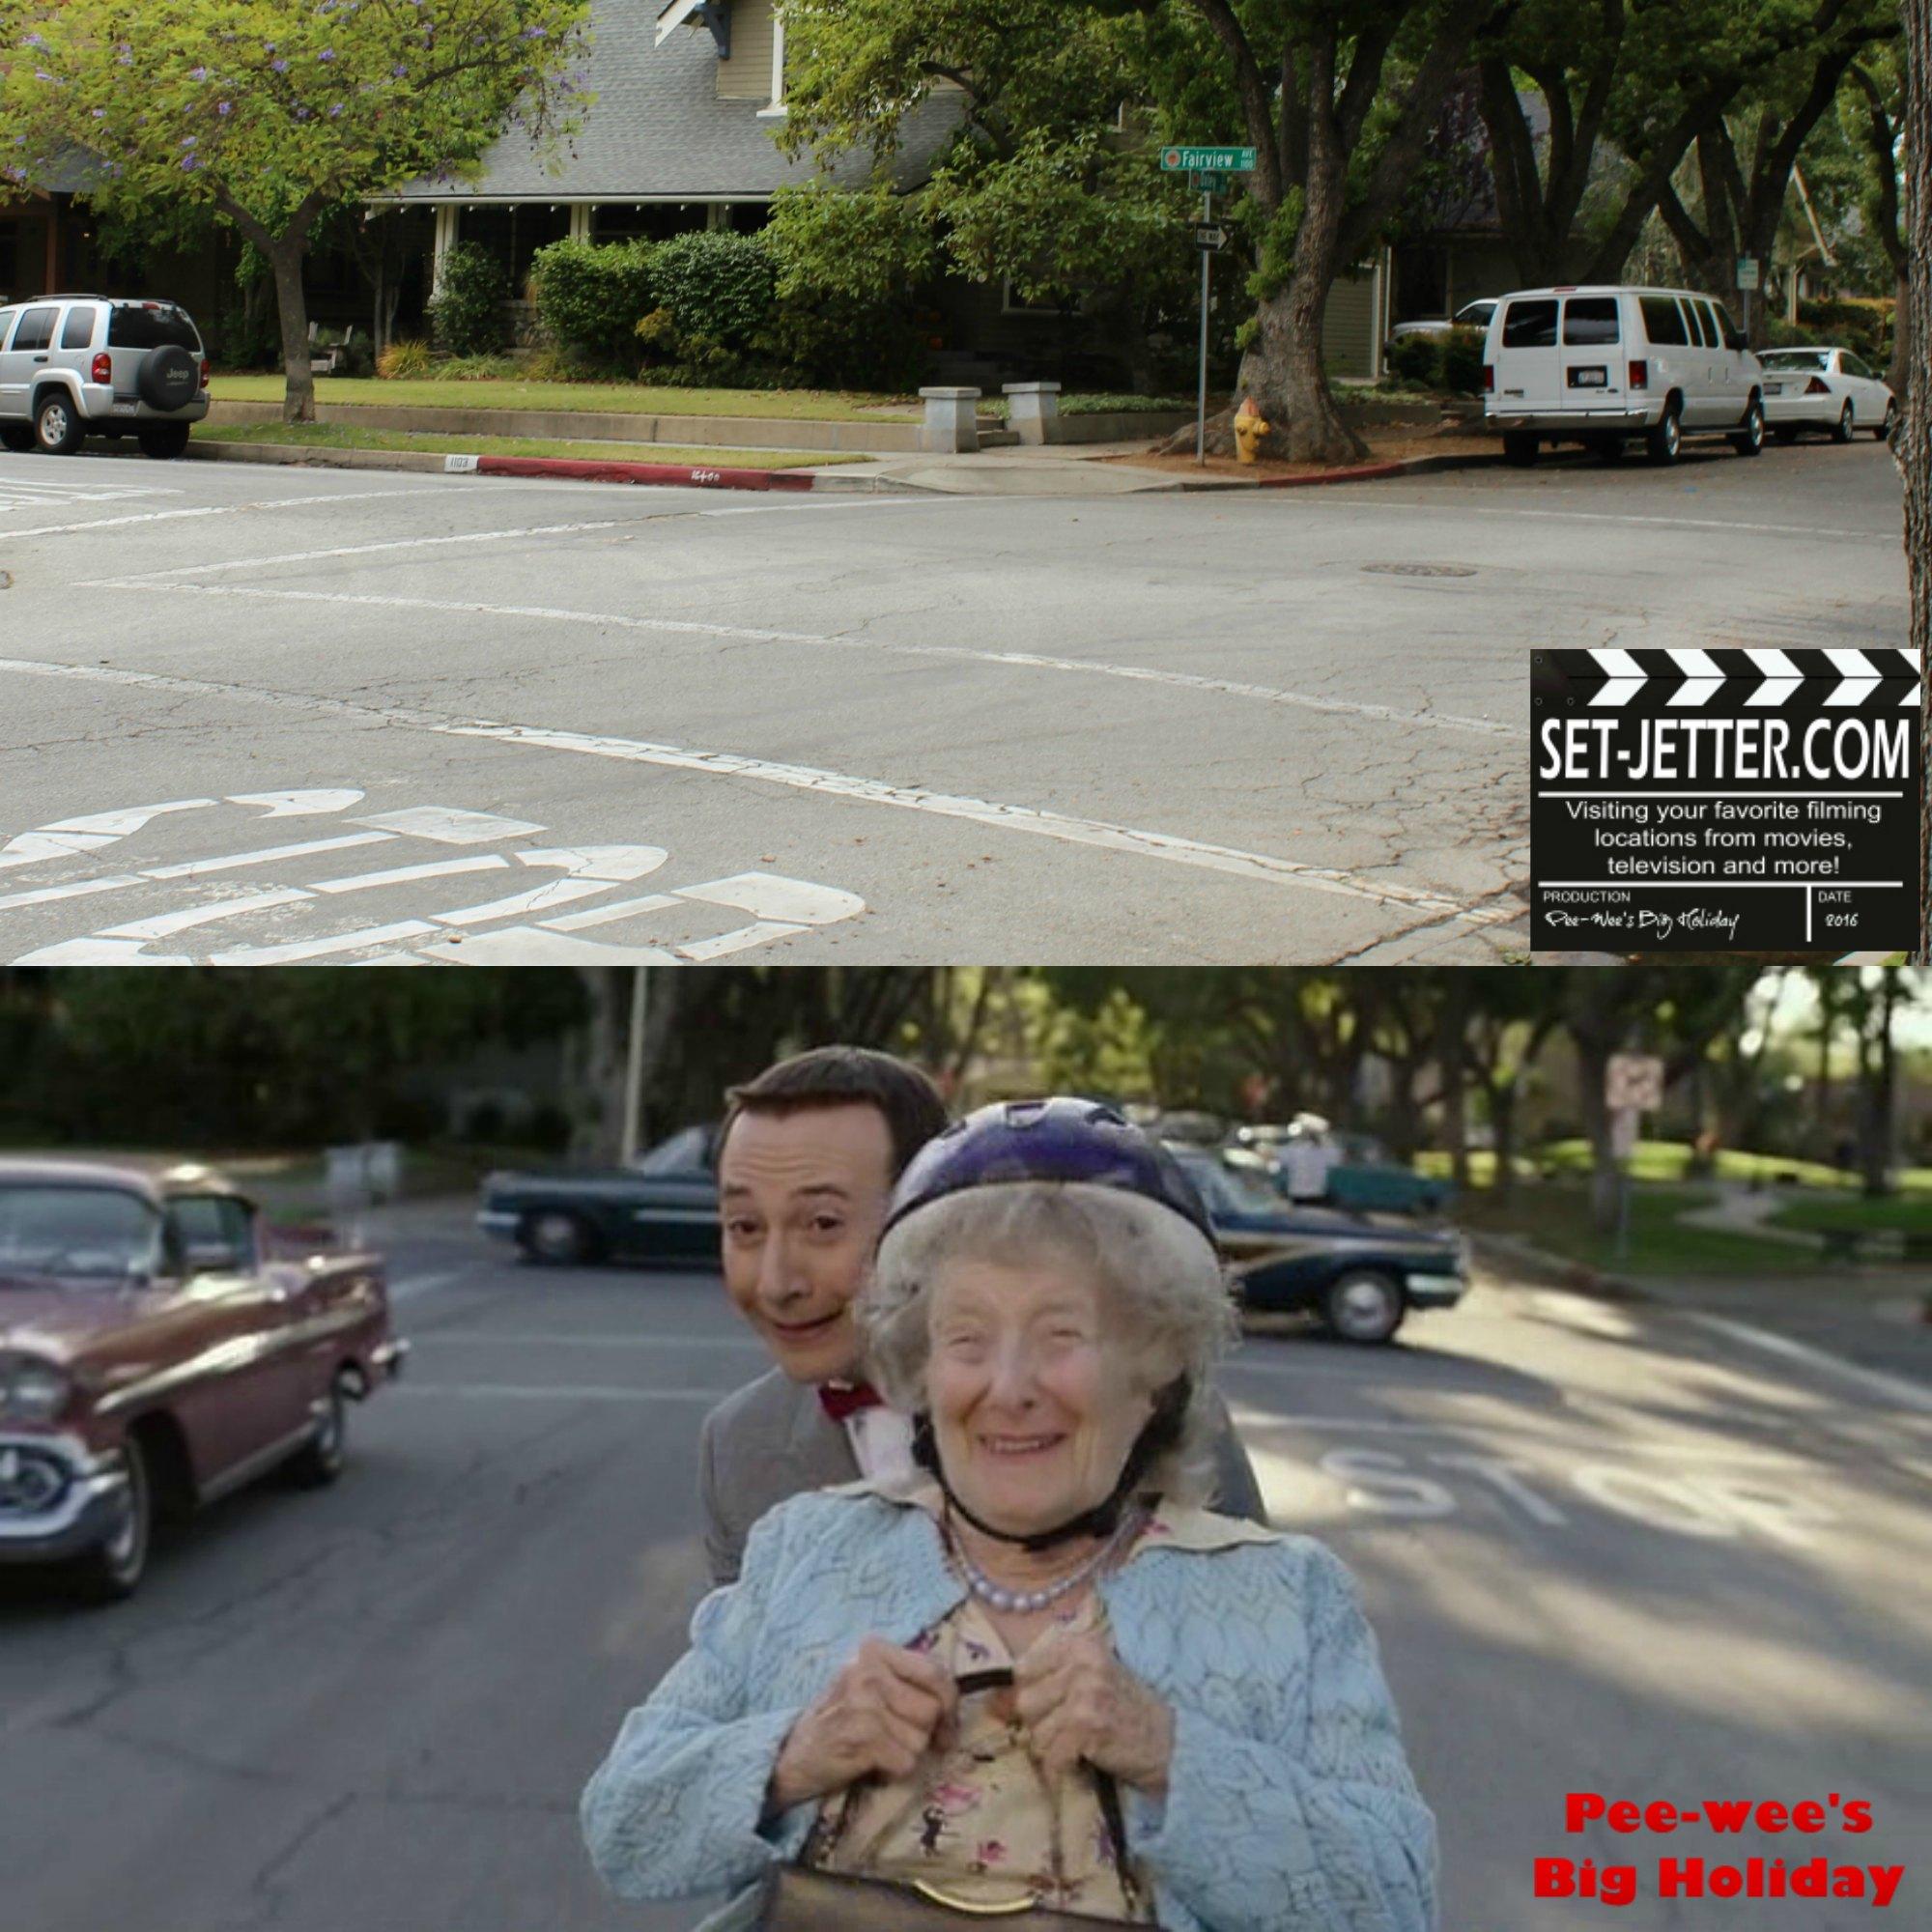 Pee Wee's Big Holiday comparison 235.jpg